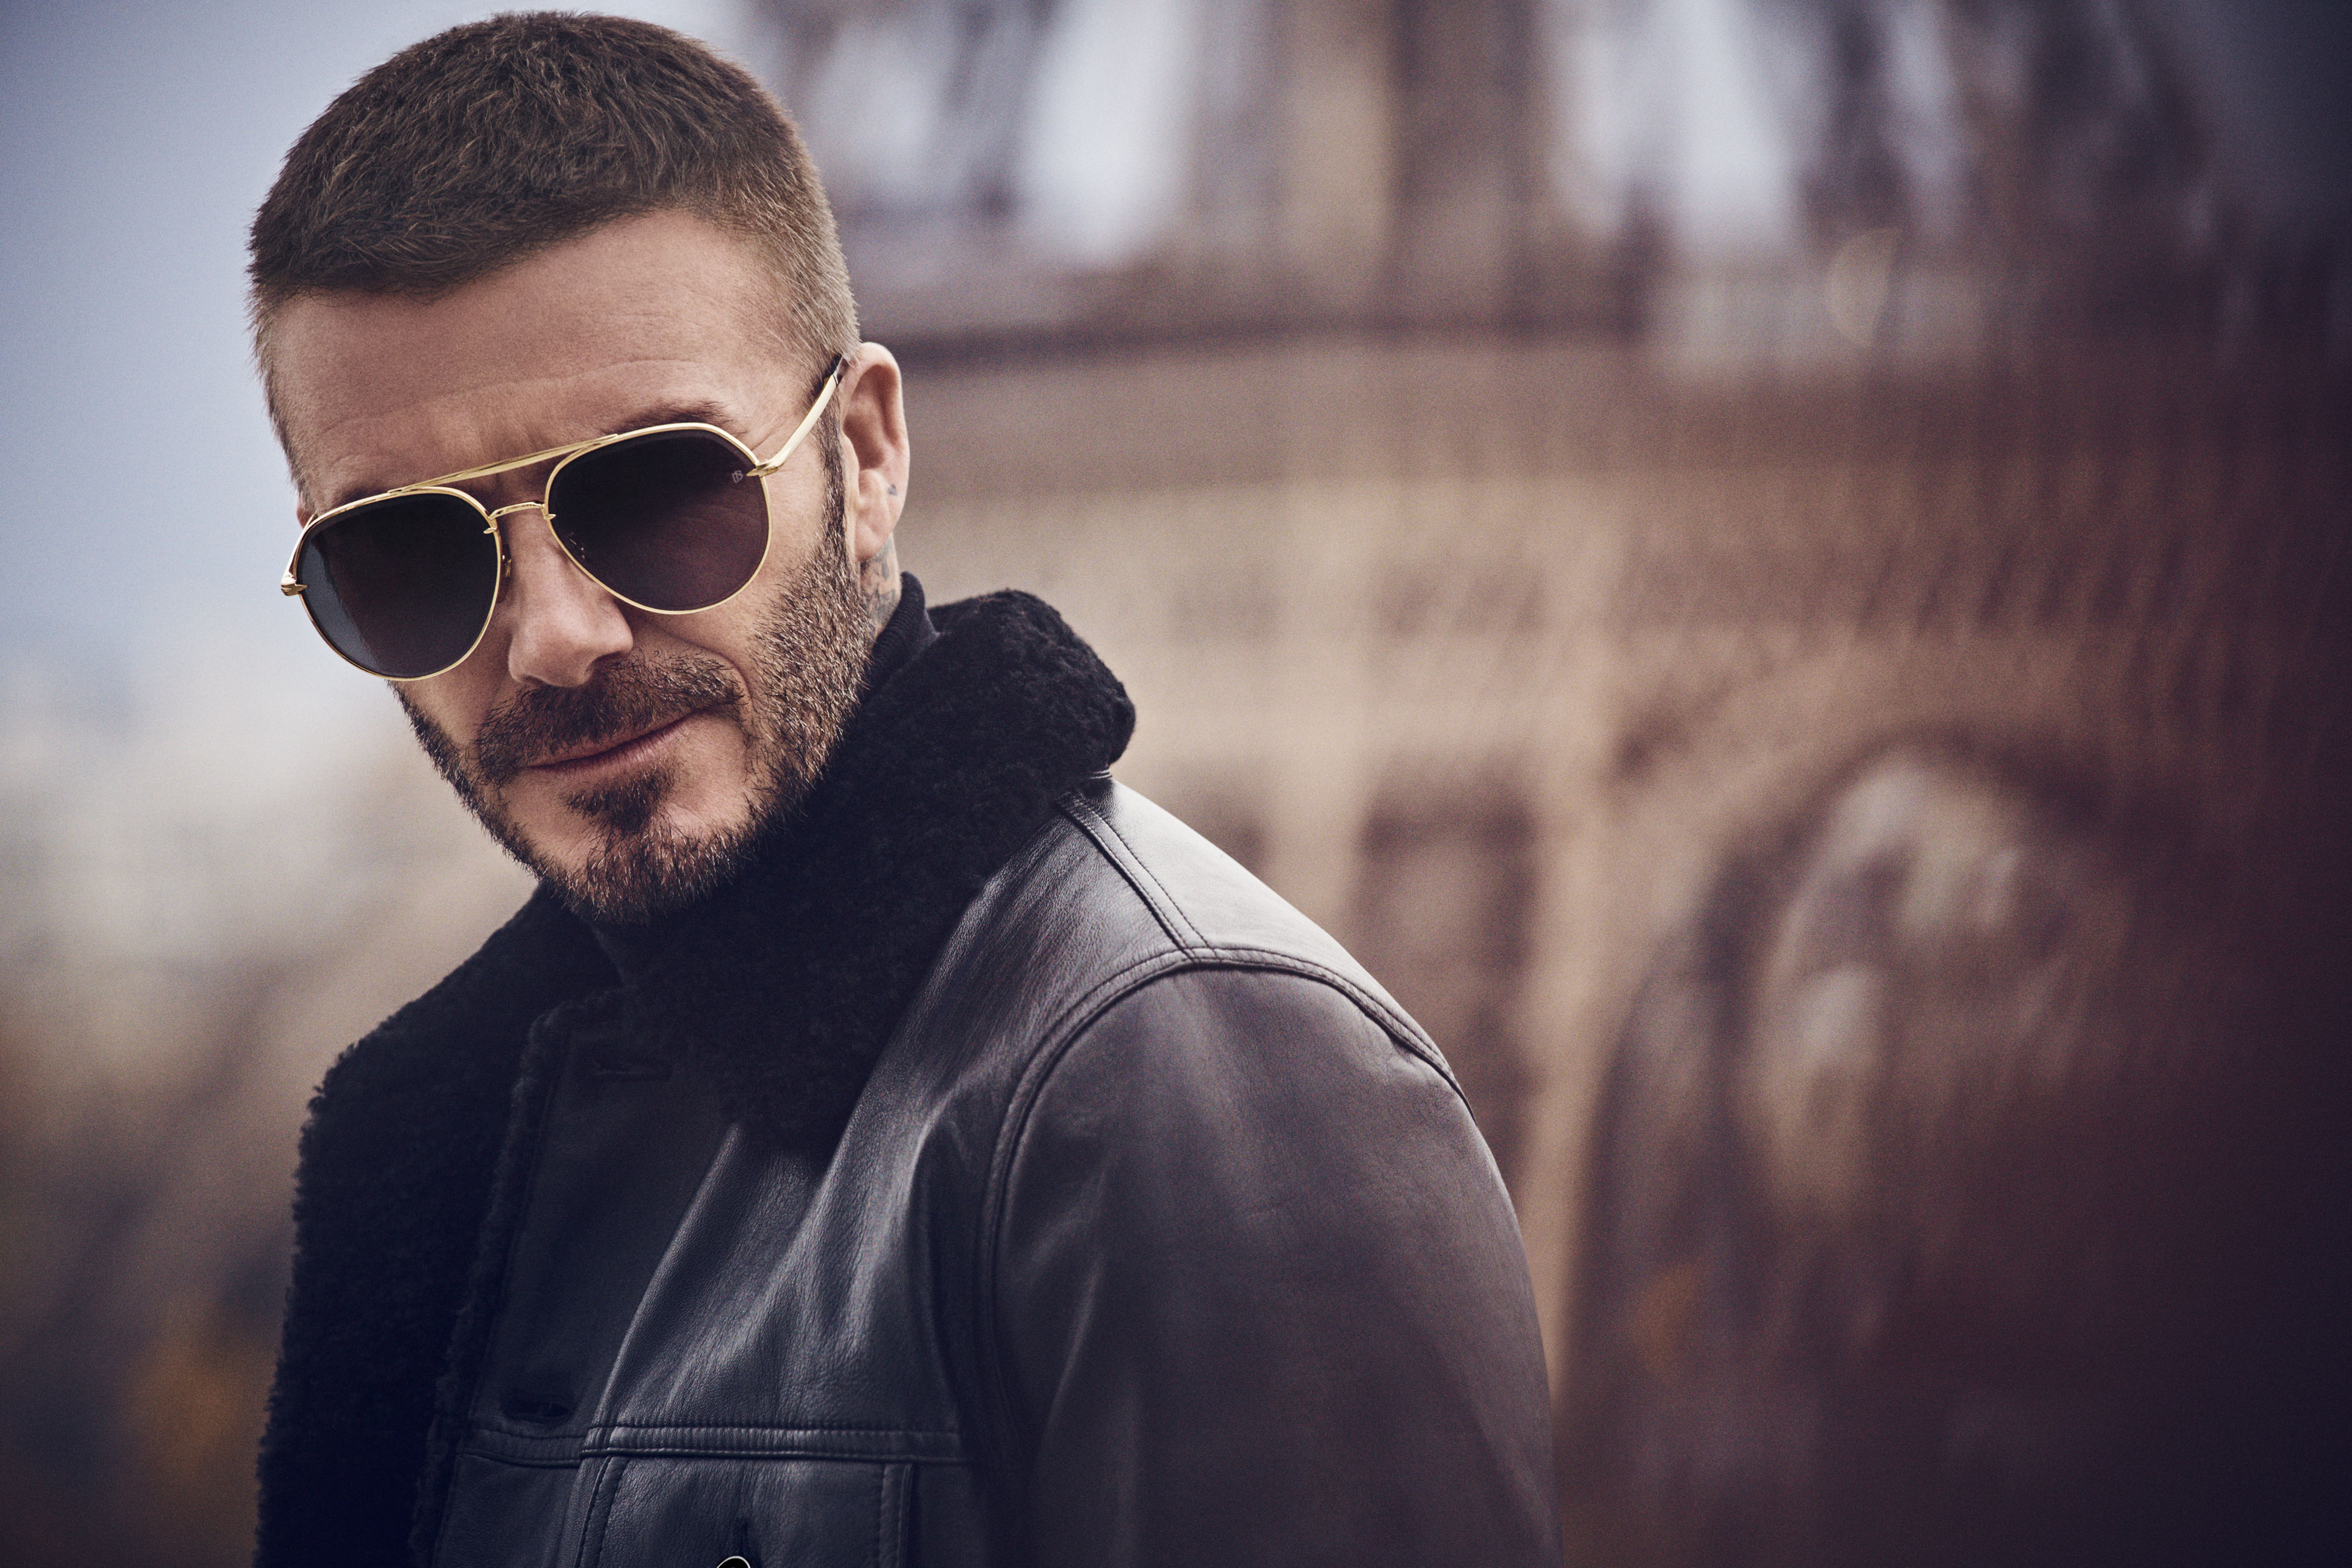 Preview featuring Eyewear by David Beckham